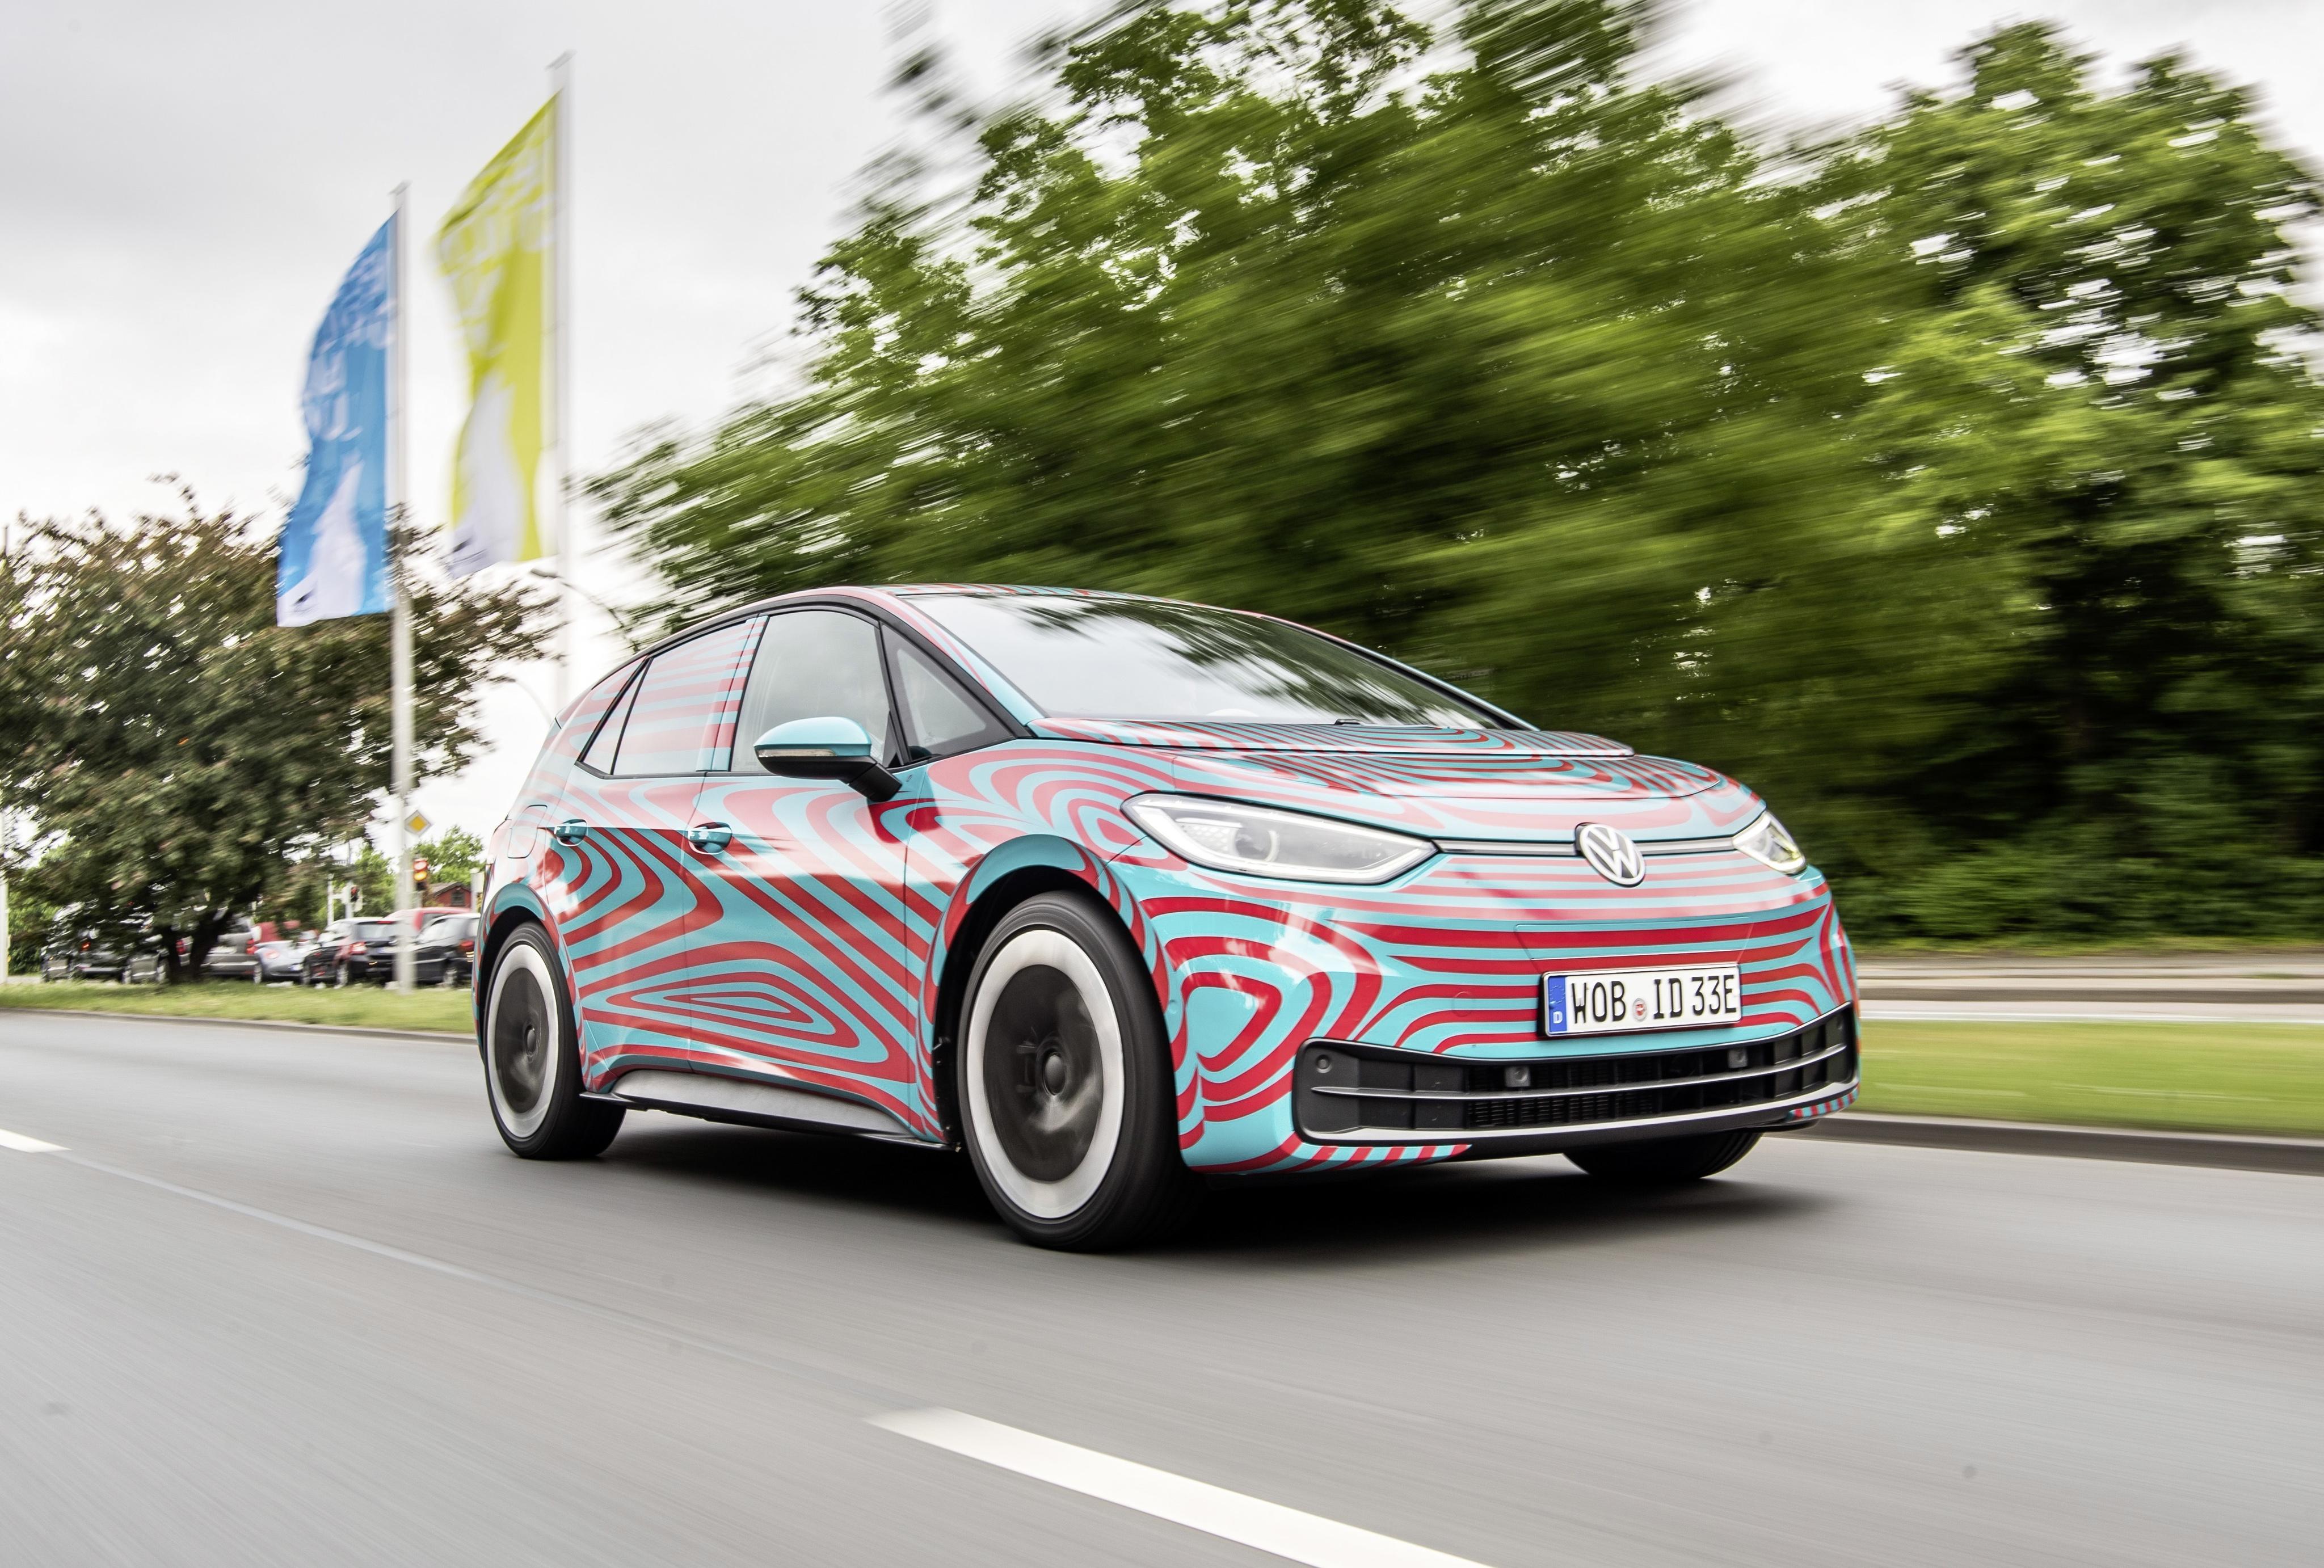 Volkswagen ID 3 camouflage IAA Frankfurt 2019